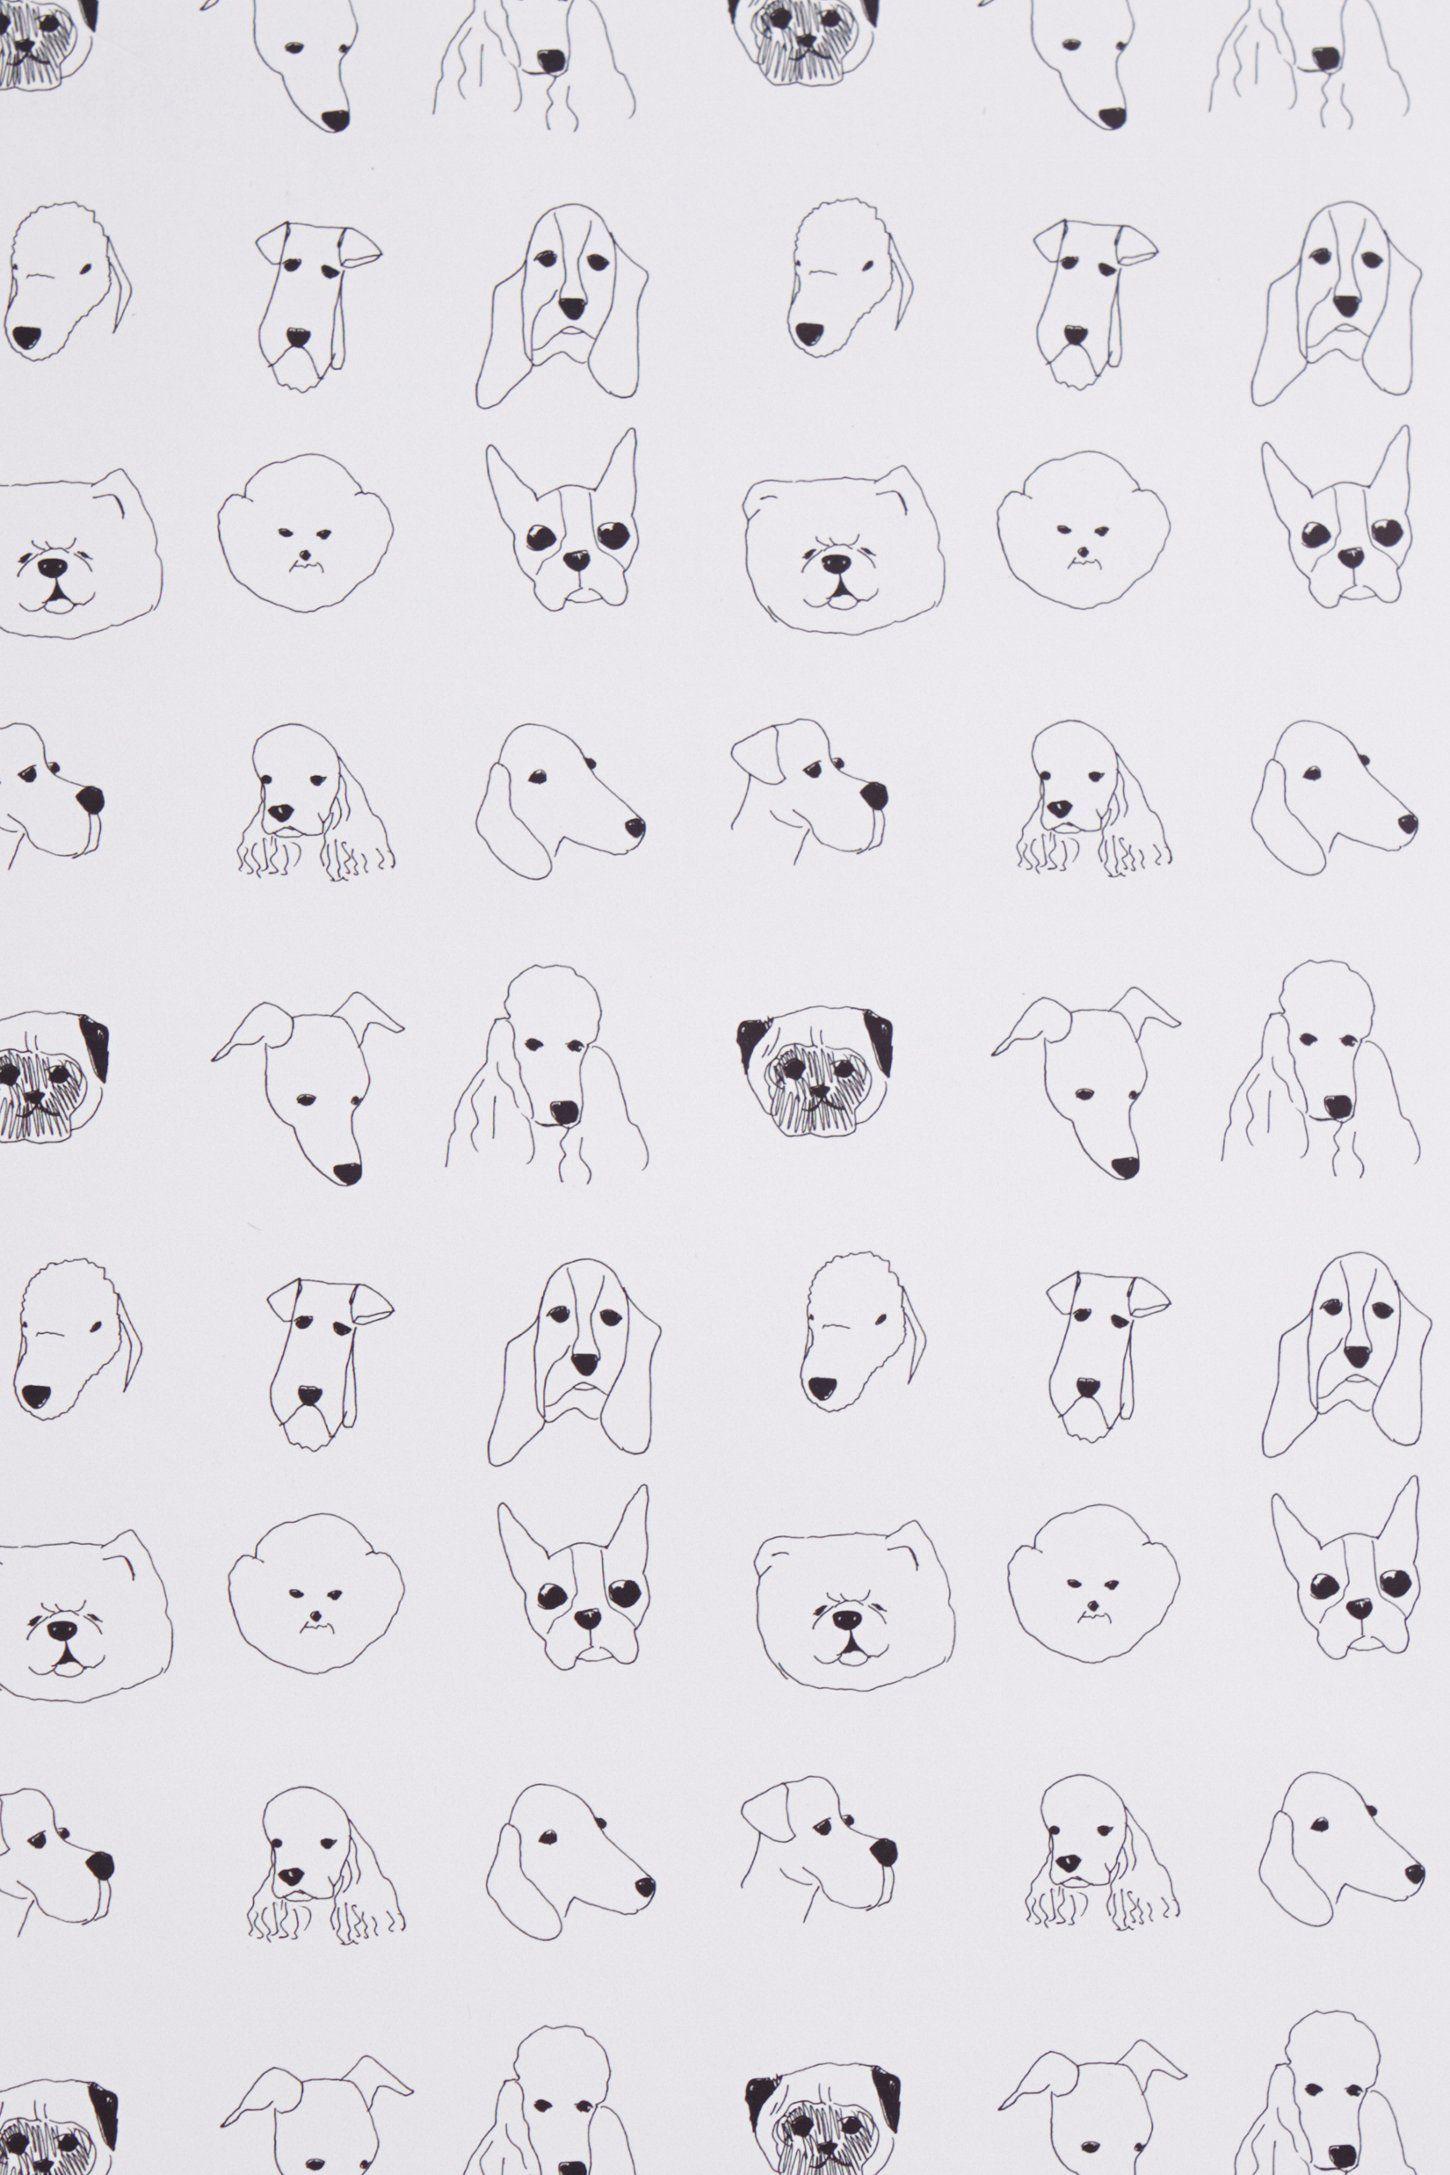 Dogs Wallpaper Dog wallpaper iphone, Cat wallpaper, Dog